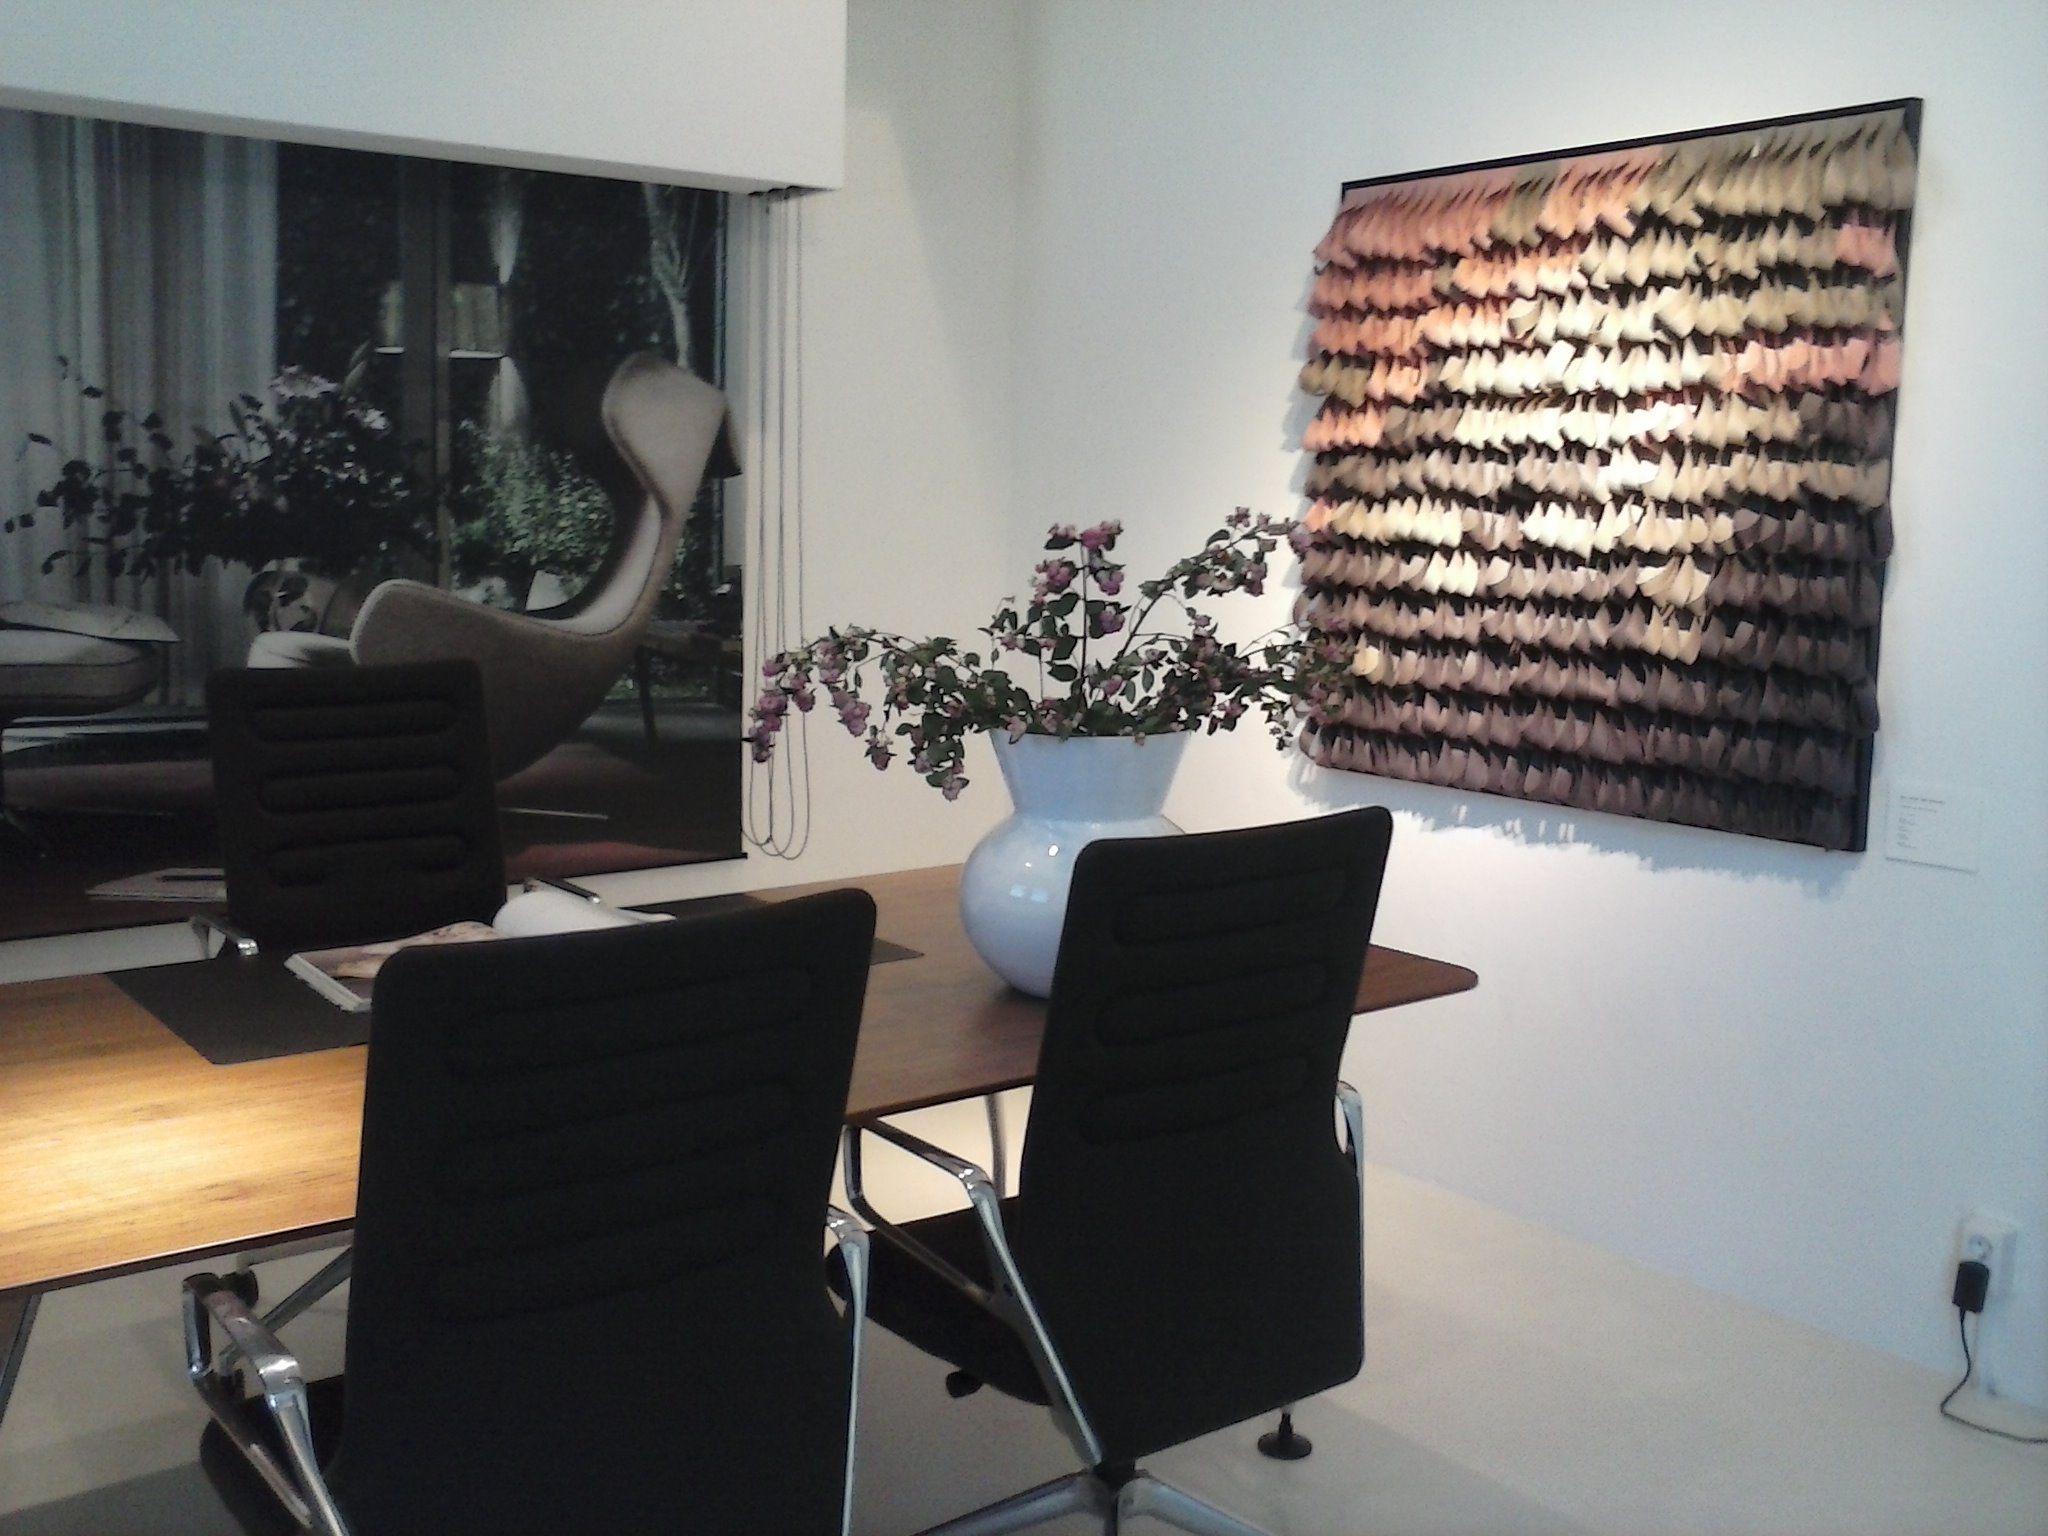 Vitra Showroom Aalsmeer the Netherlands